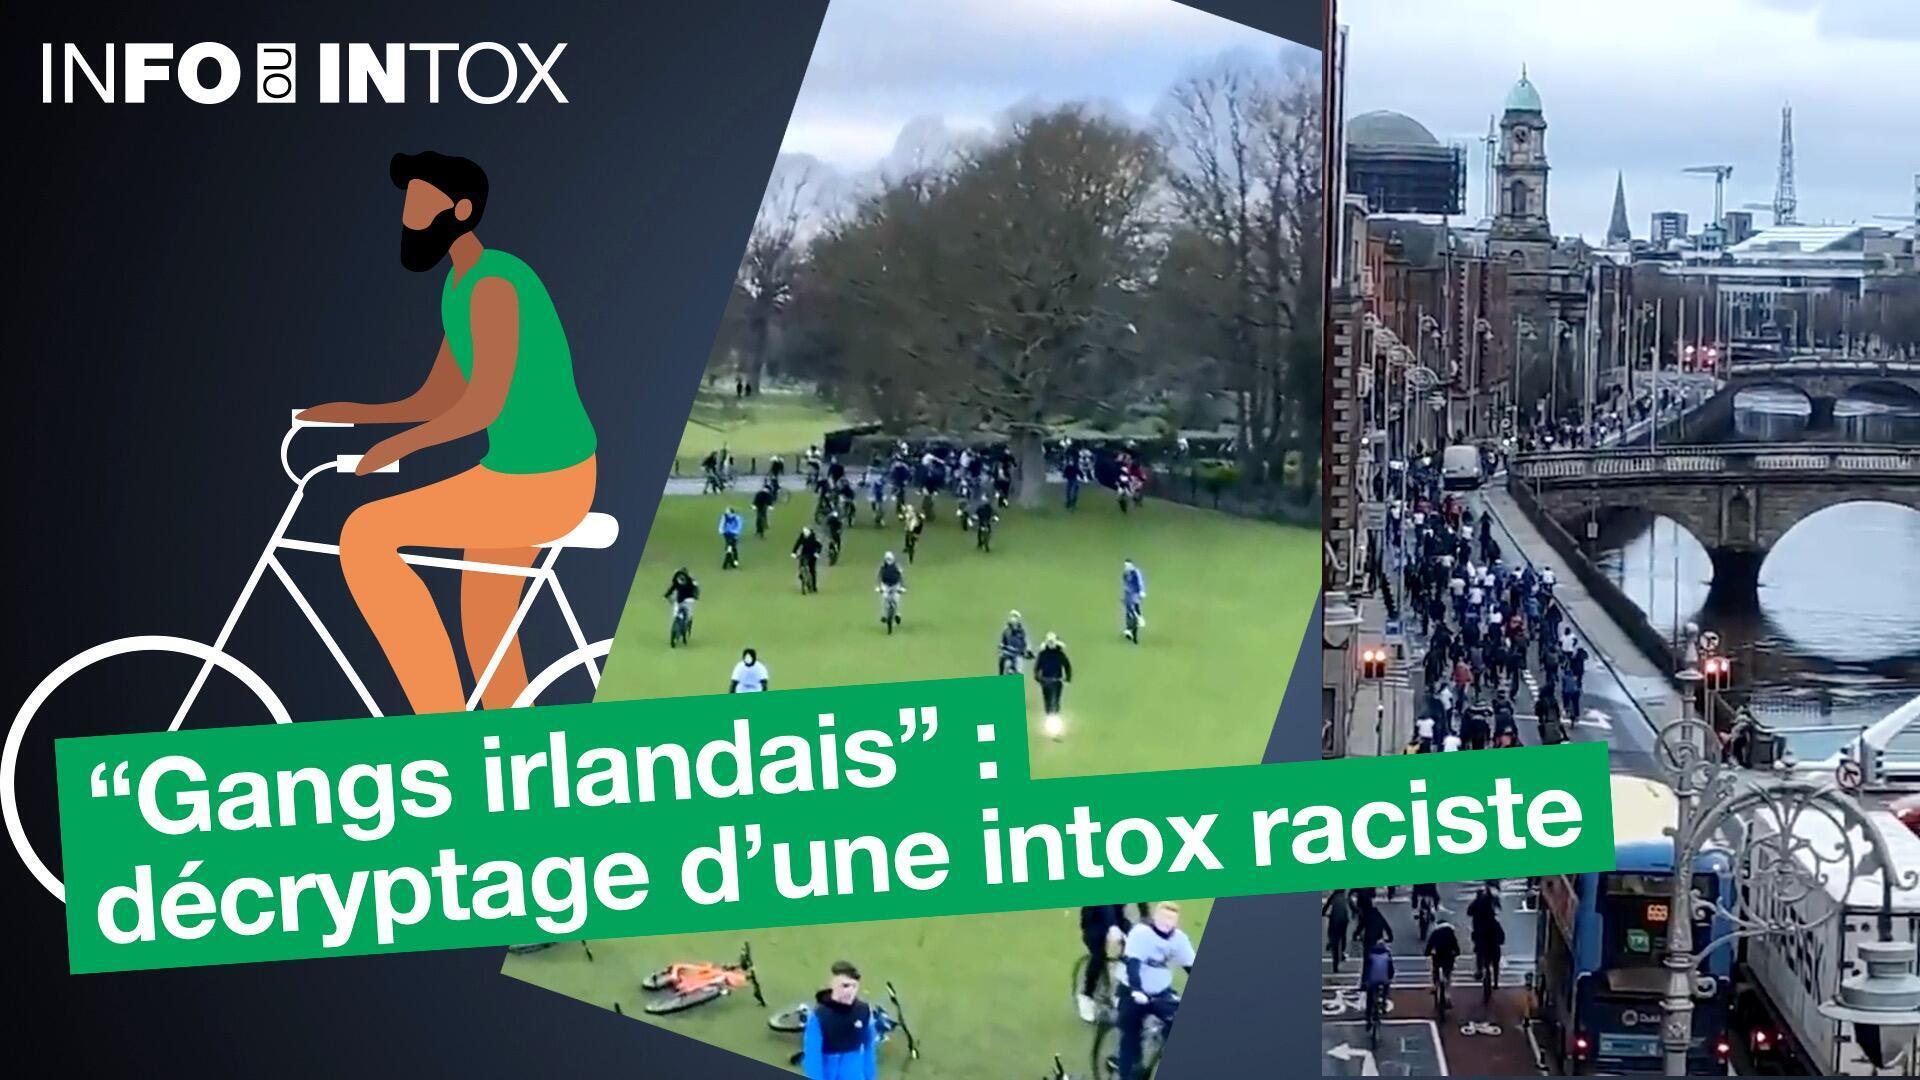 info-intox-irlande-vignette-video-1920x1080 copy